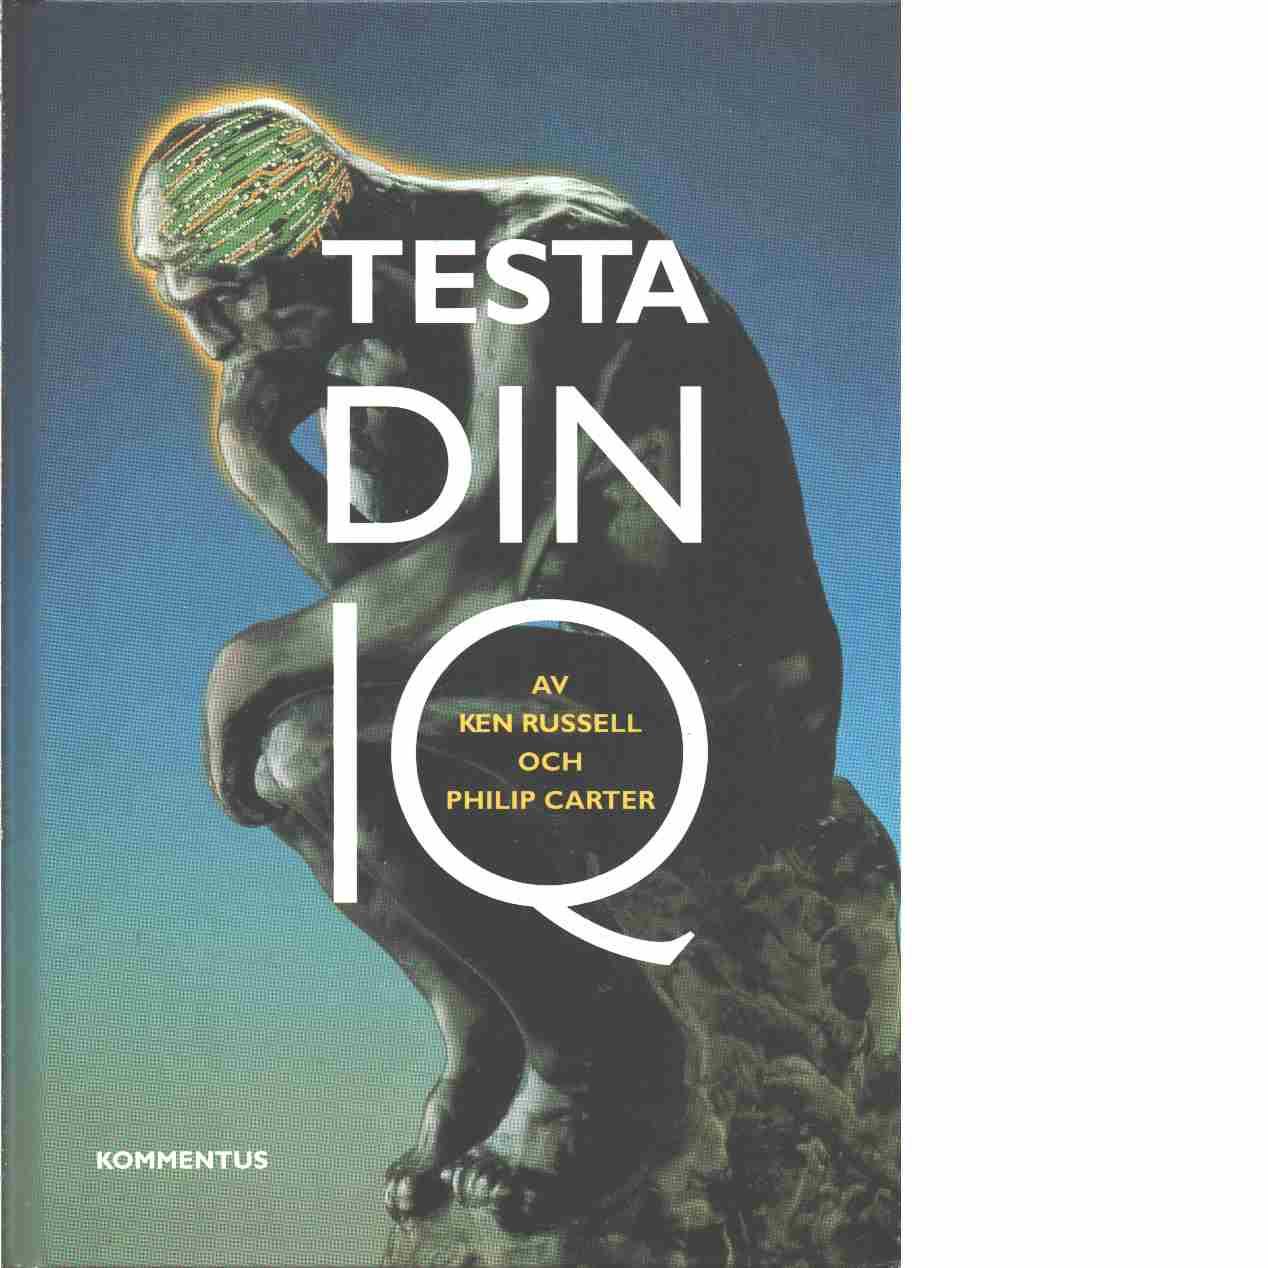 Testa din IQ - Russell, Ken och Carter, Philip J.